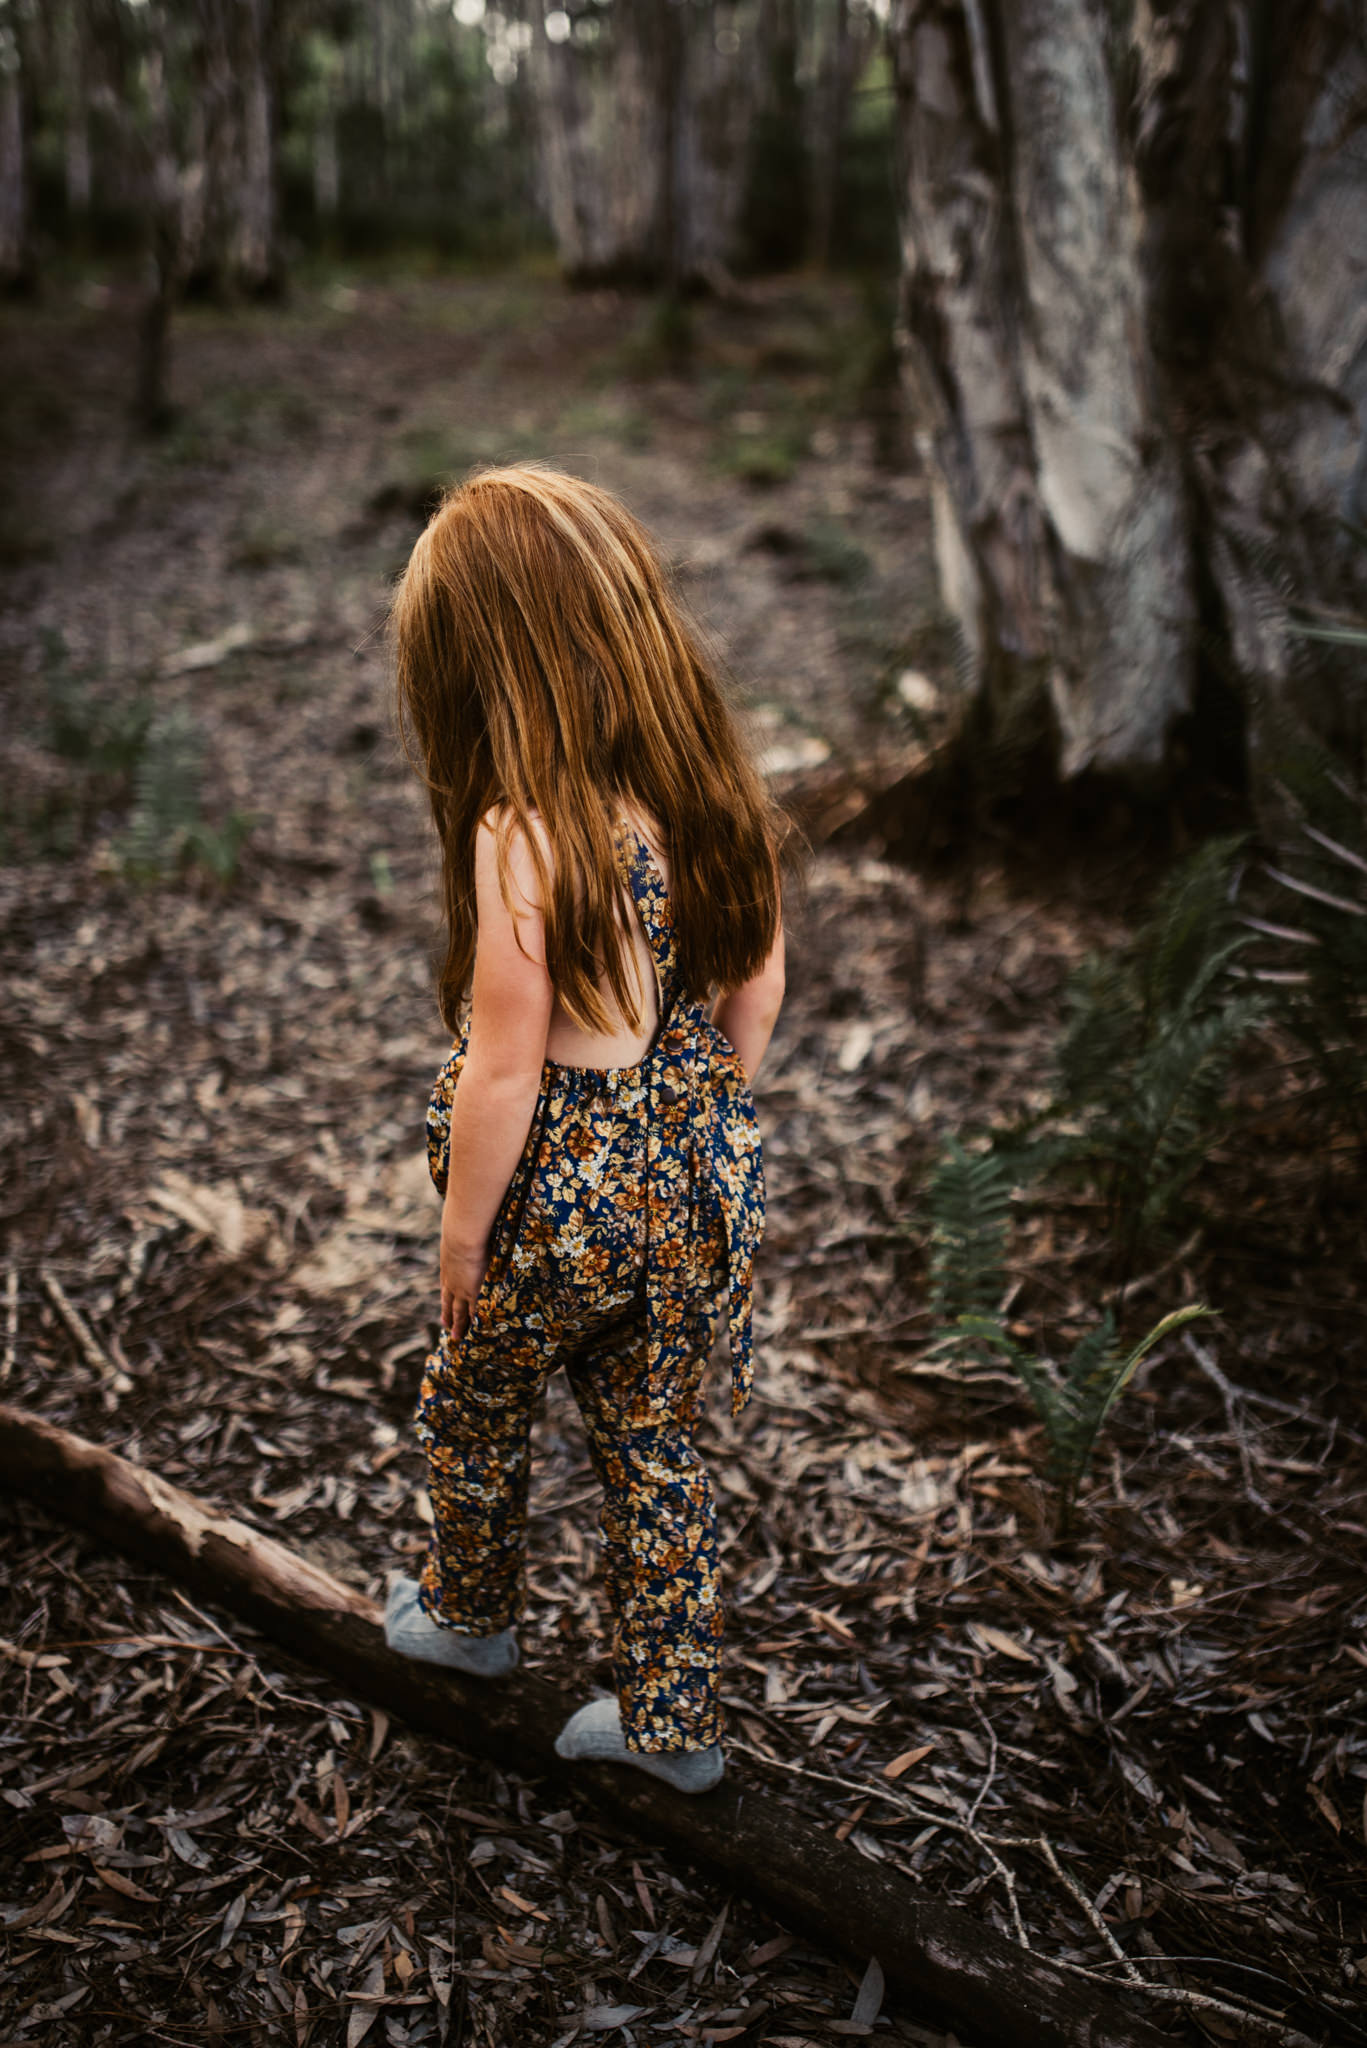 twyla jones photography - treasure coast florida - childrens adventure clothing commercial shoot--38.jpg